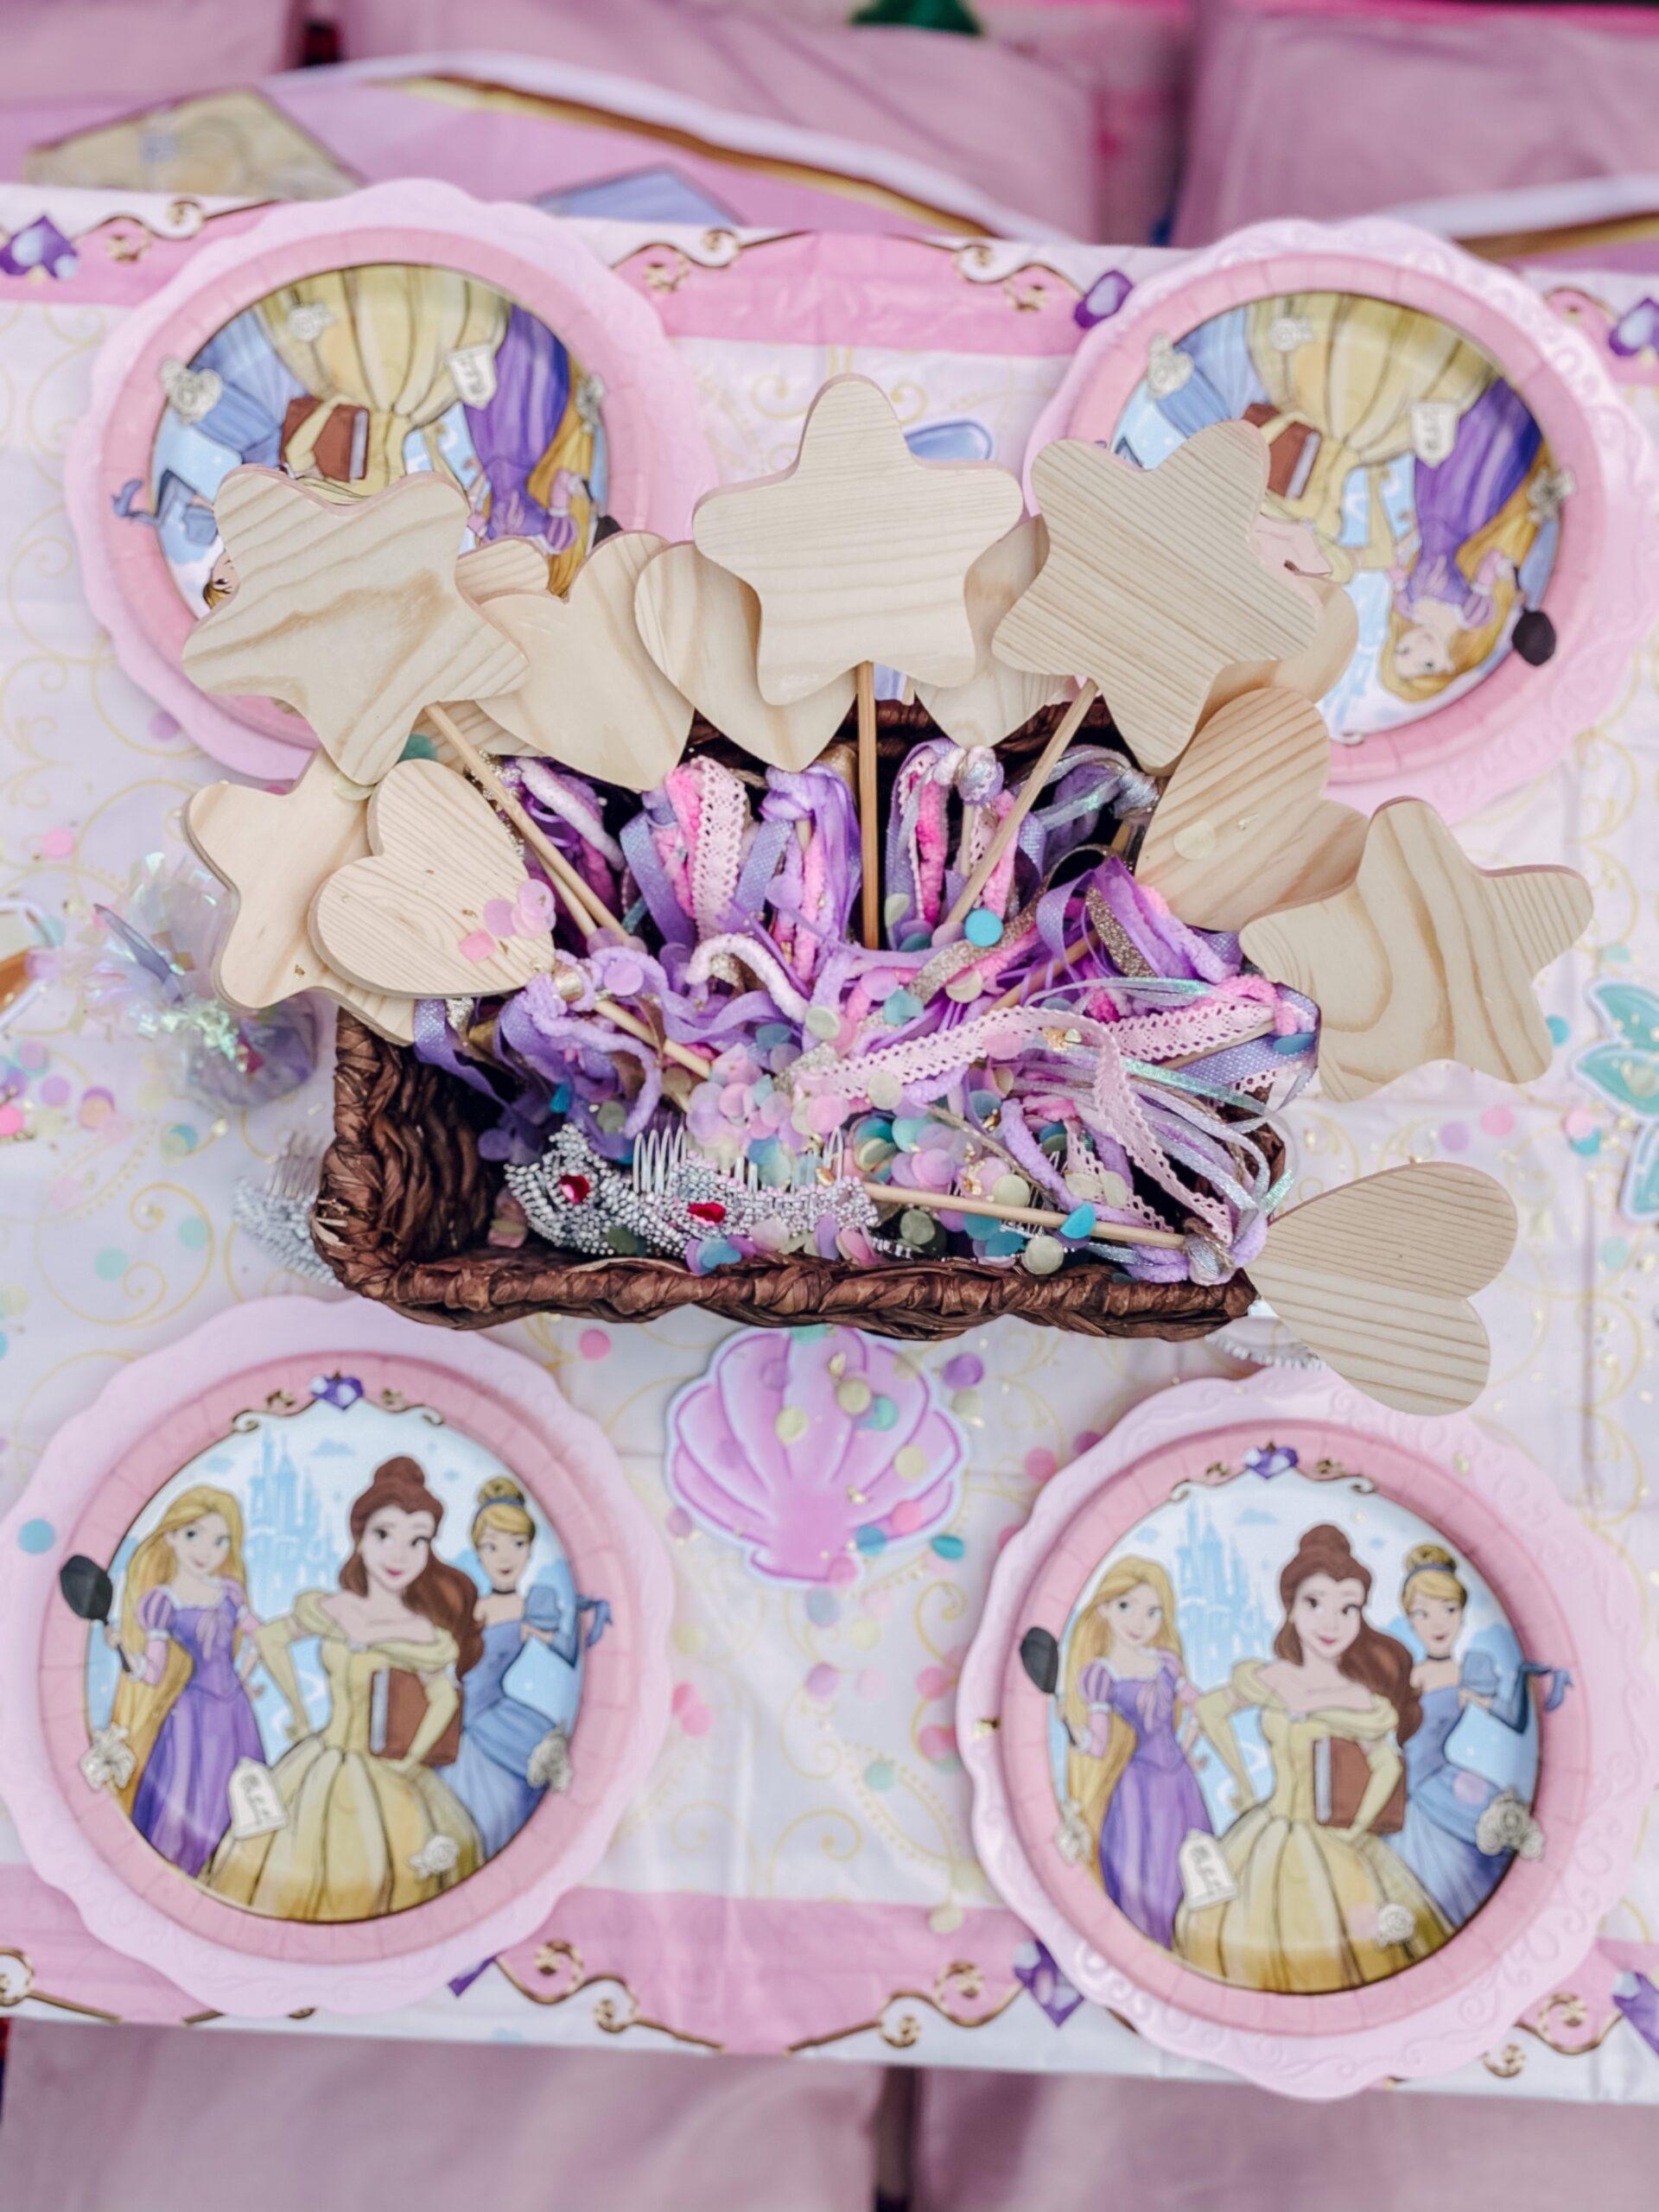 Disney Princess Party Picnic Table